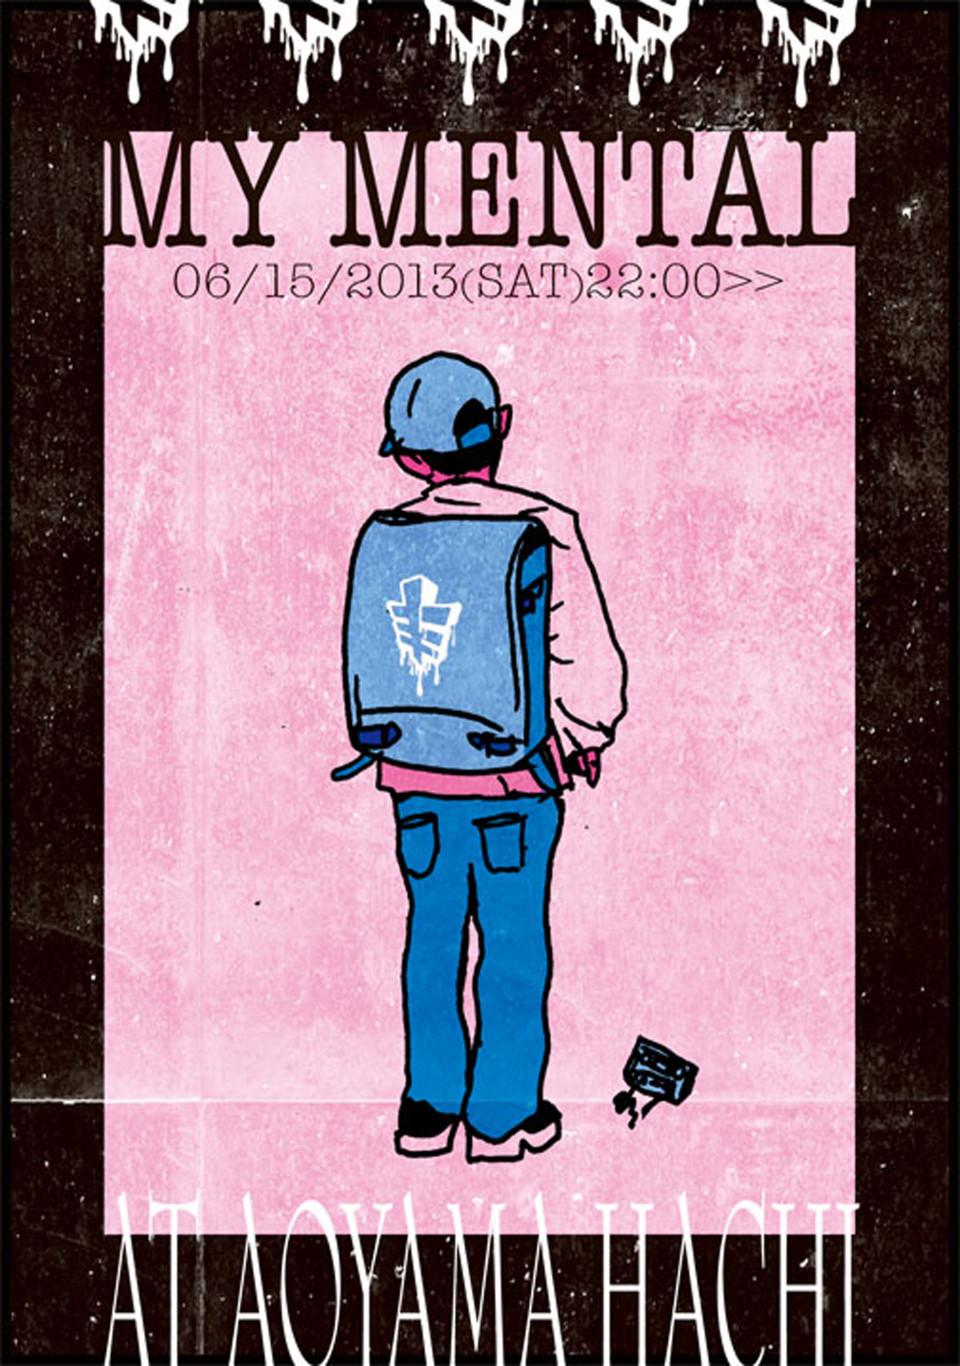 mymental